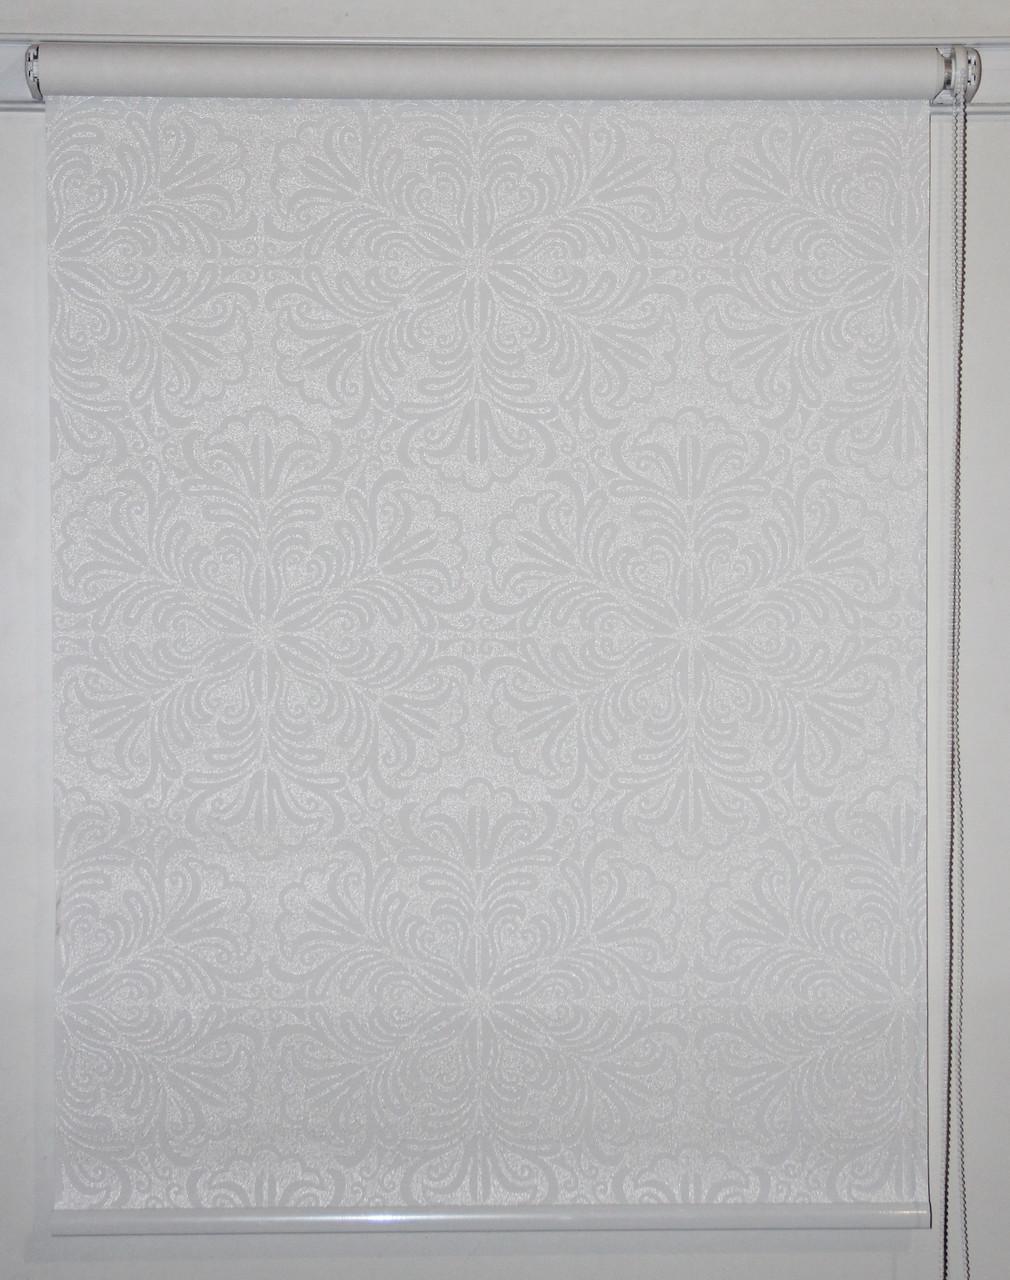 Готовые рулонные шторы 325*1500 Ткань Эмир Белый